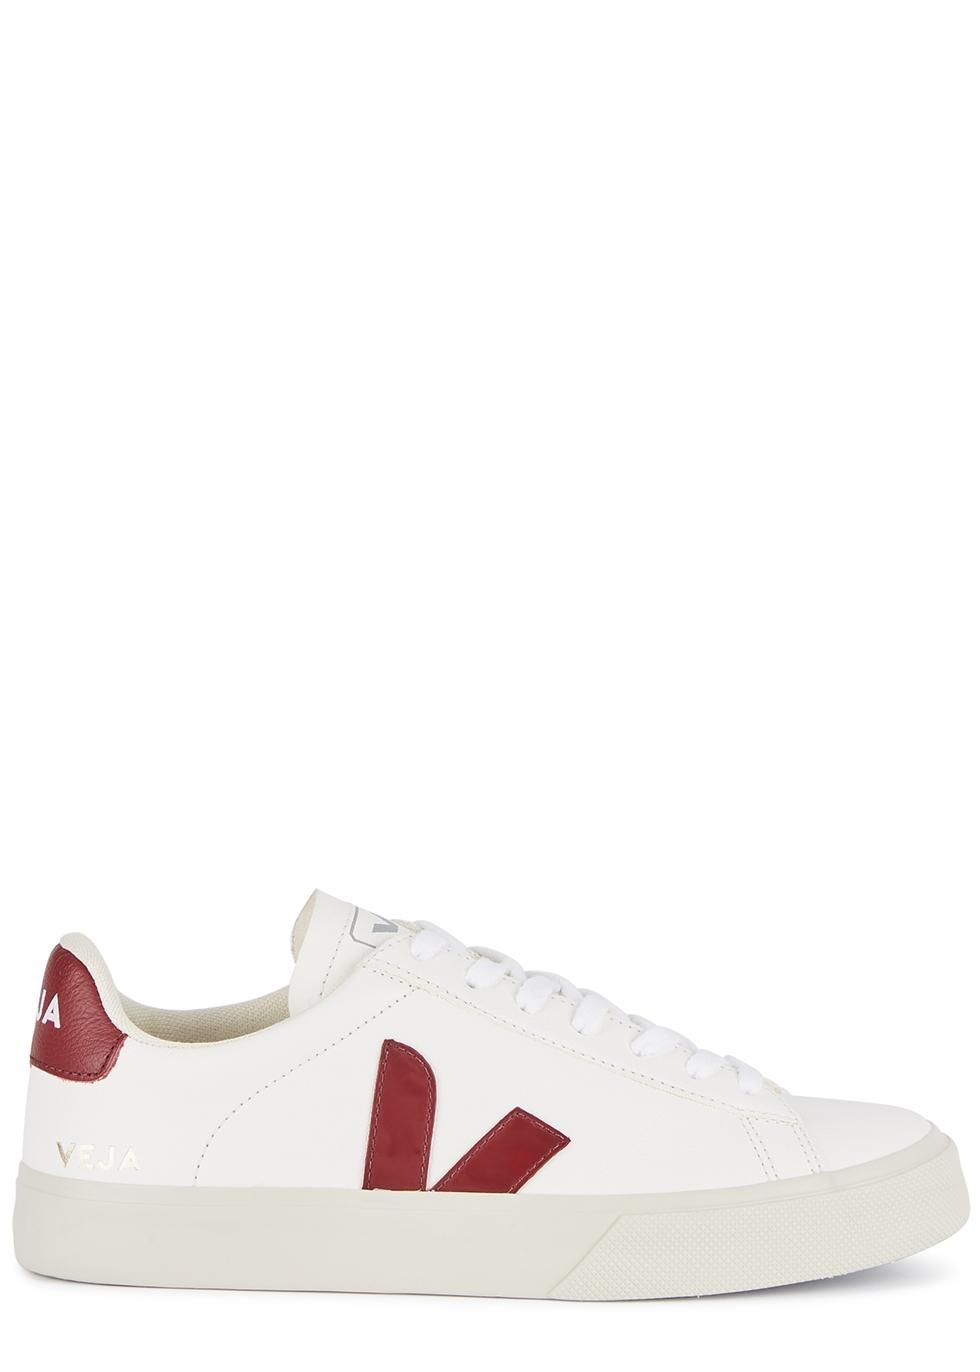 veja volley grey black, Veja Herren Sneaker ESPLAR Sneaker